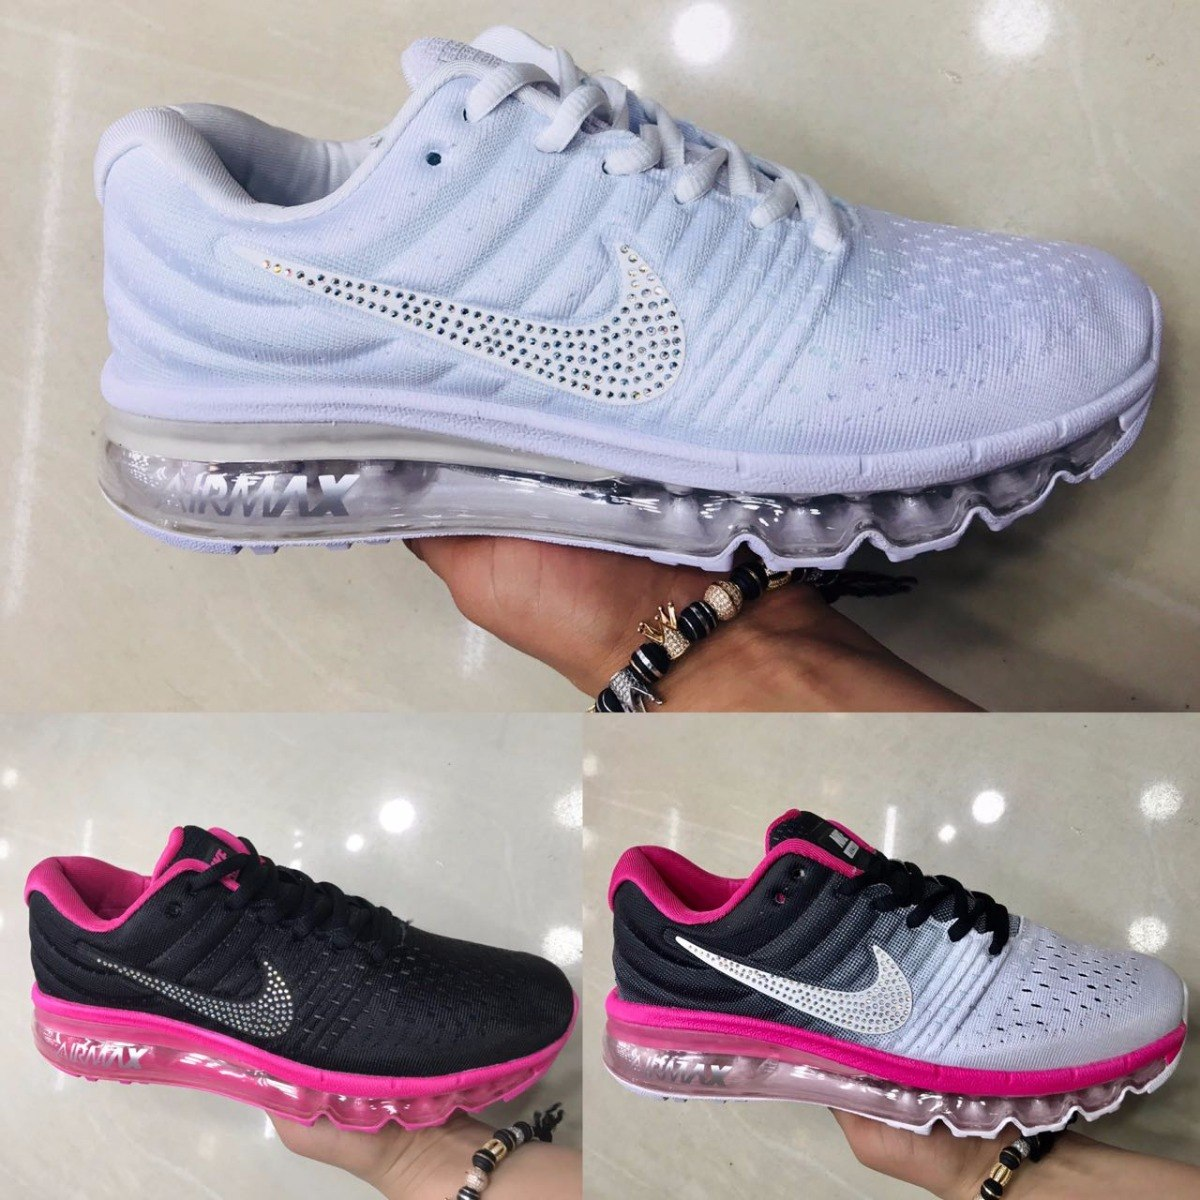 40ac3ffd16a39 Tenis Nike Air Max 360 Mujer 2017 Precio Envio Gratis -   139.000 en ...